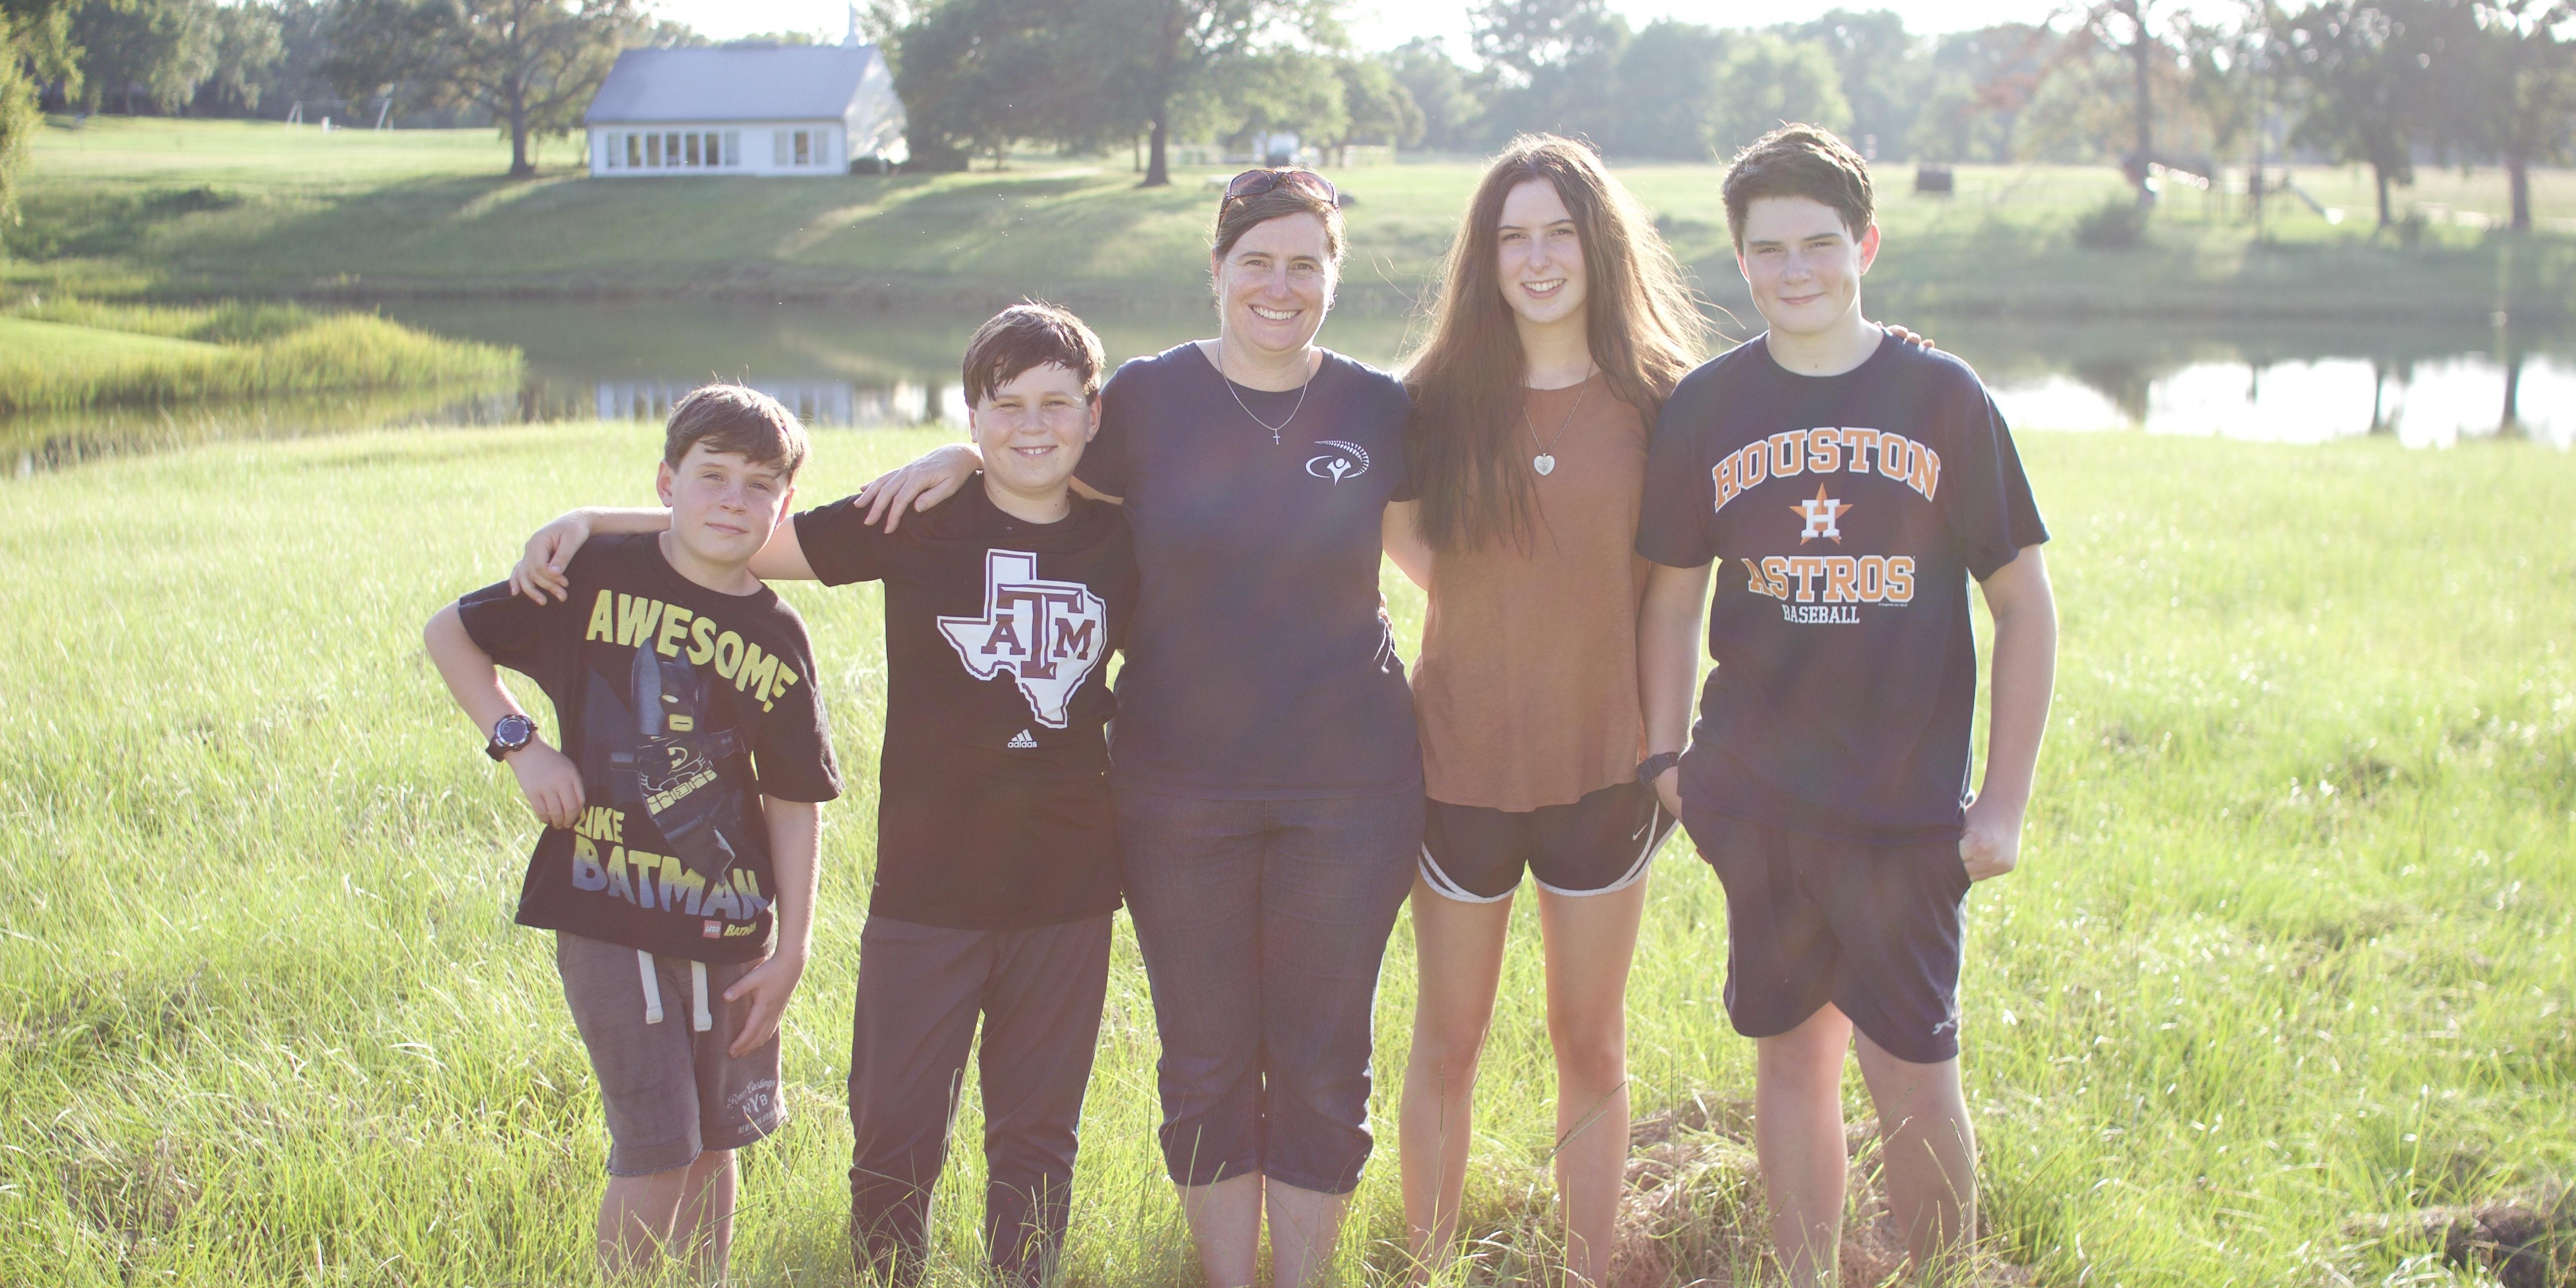 Brown Family-658187-edited.jpg